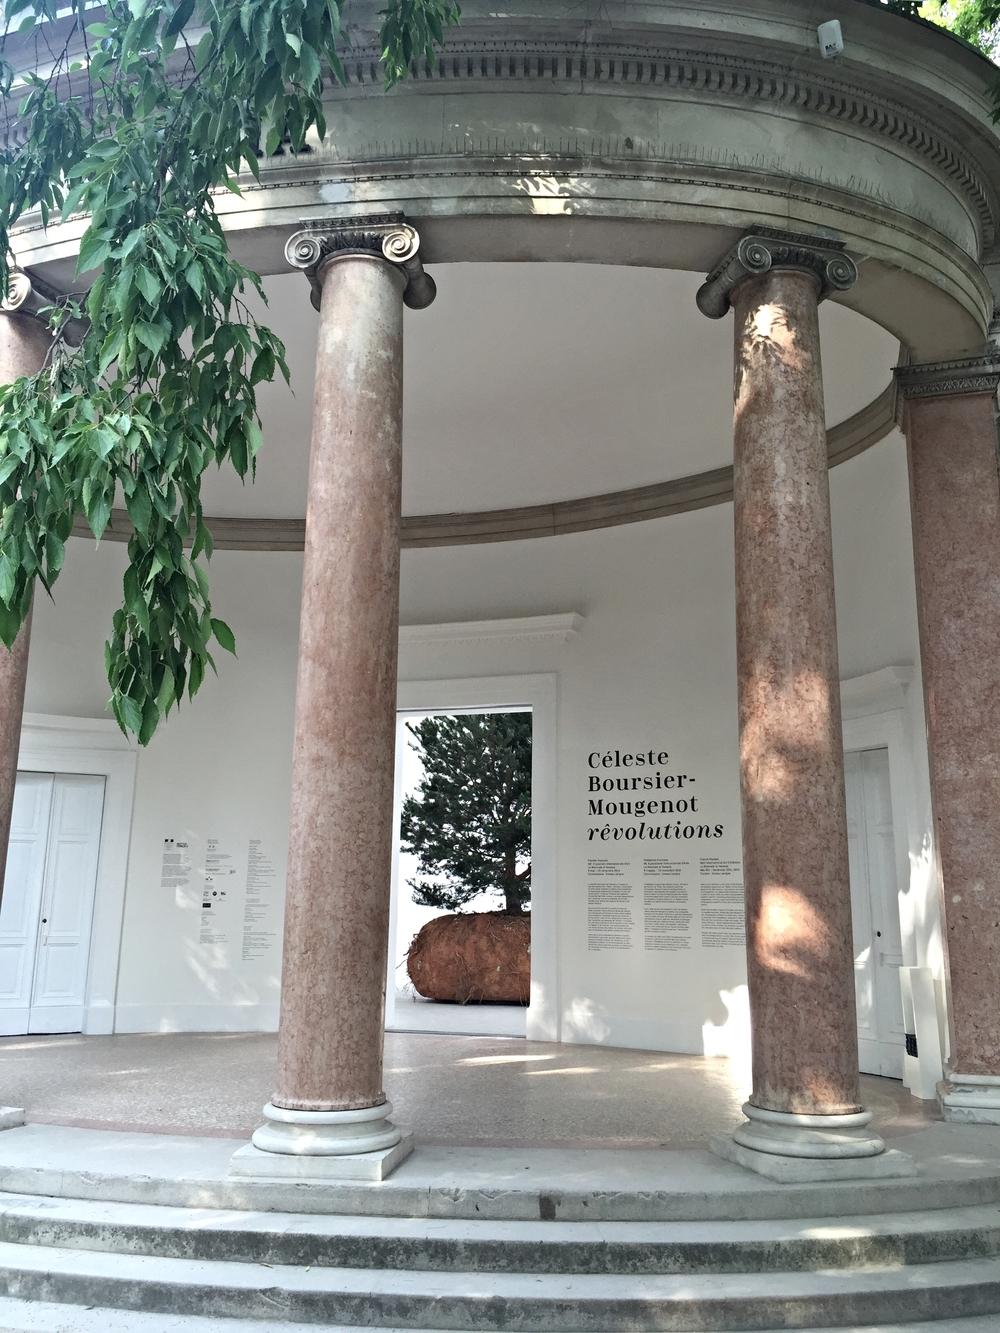 France's pavilion